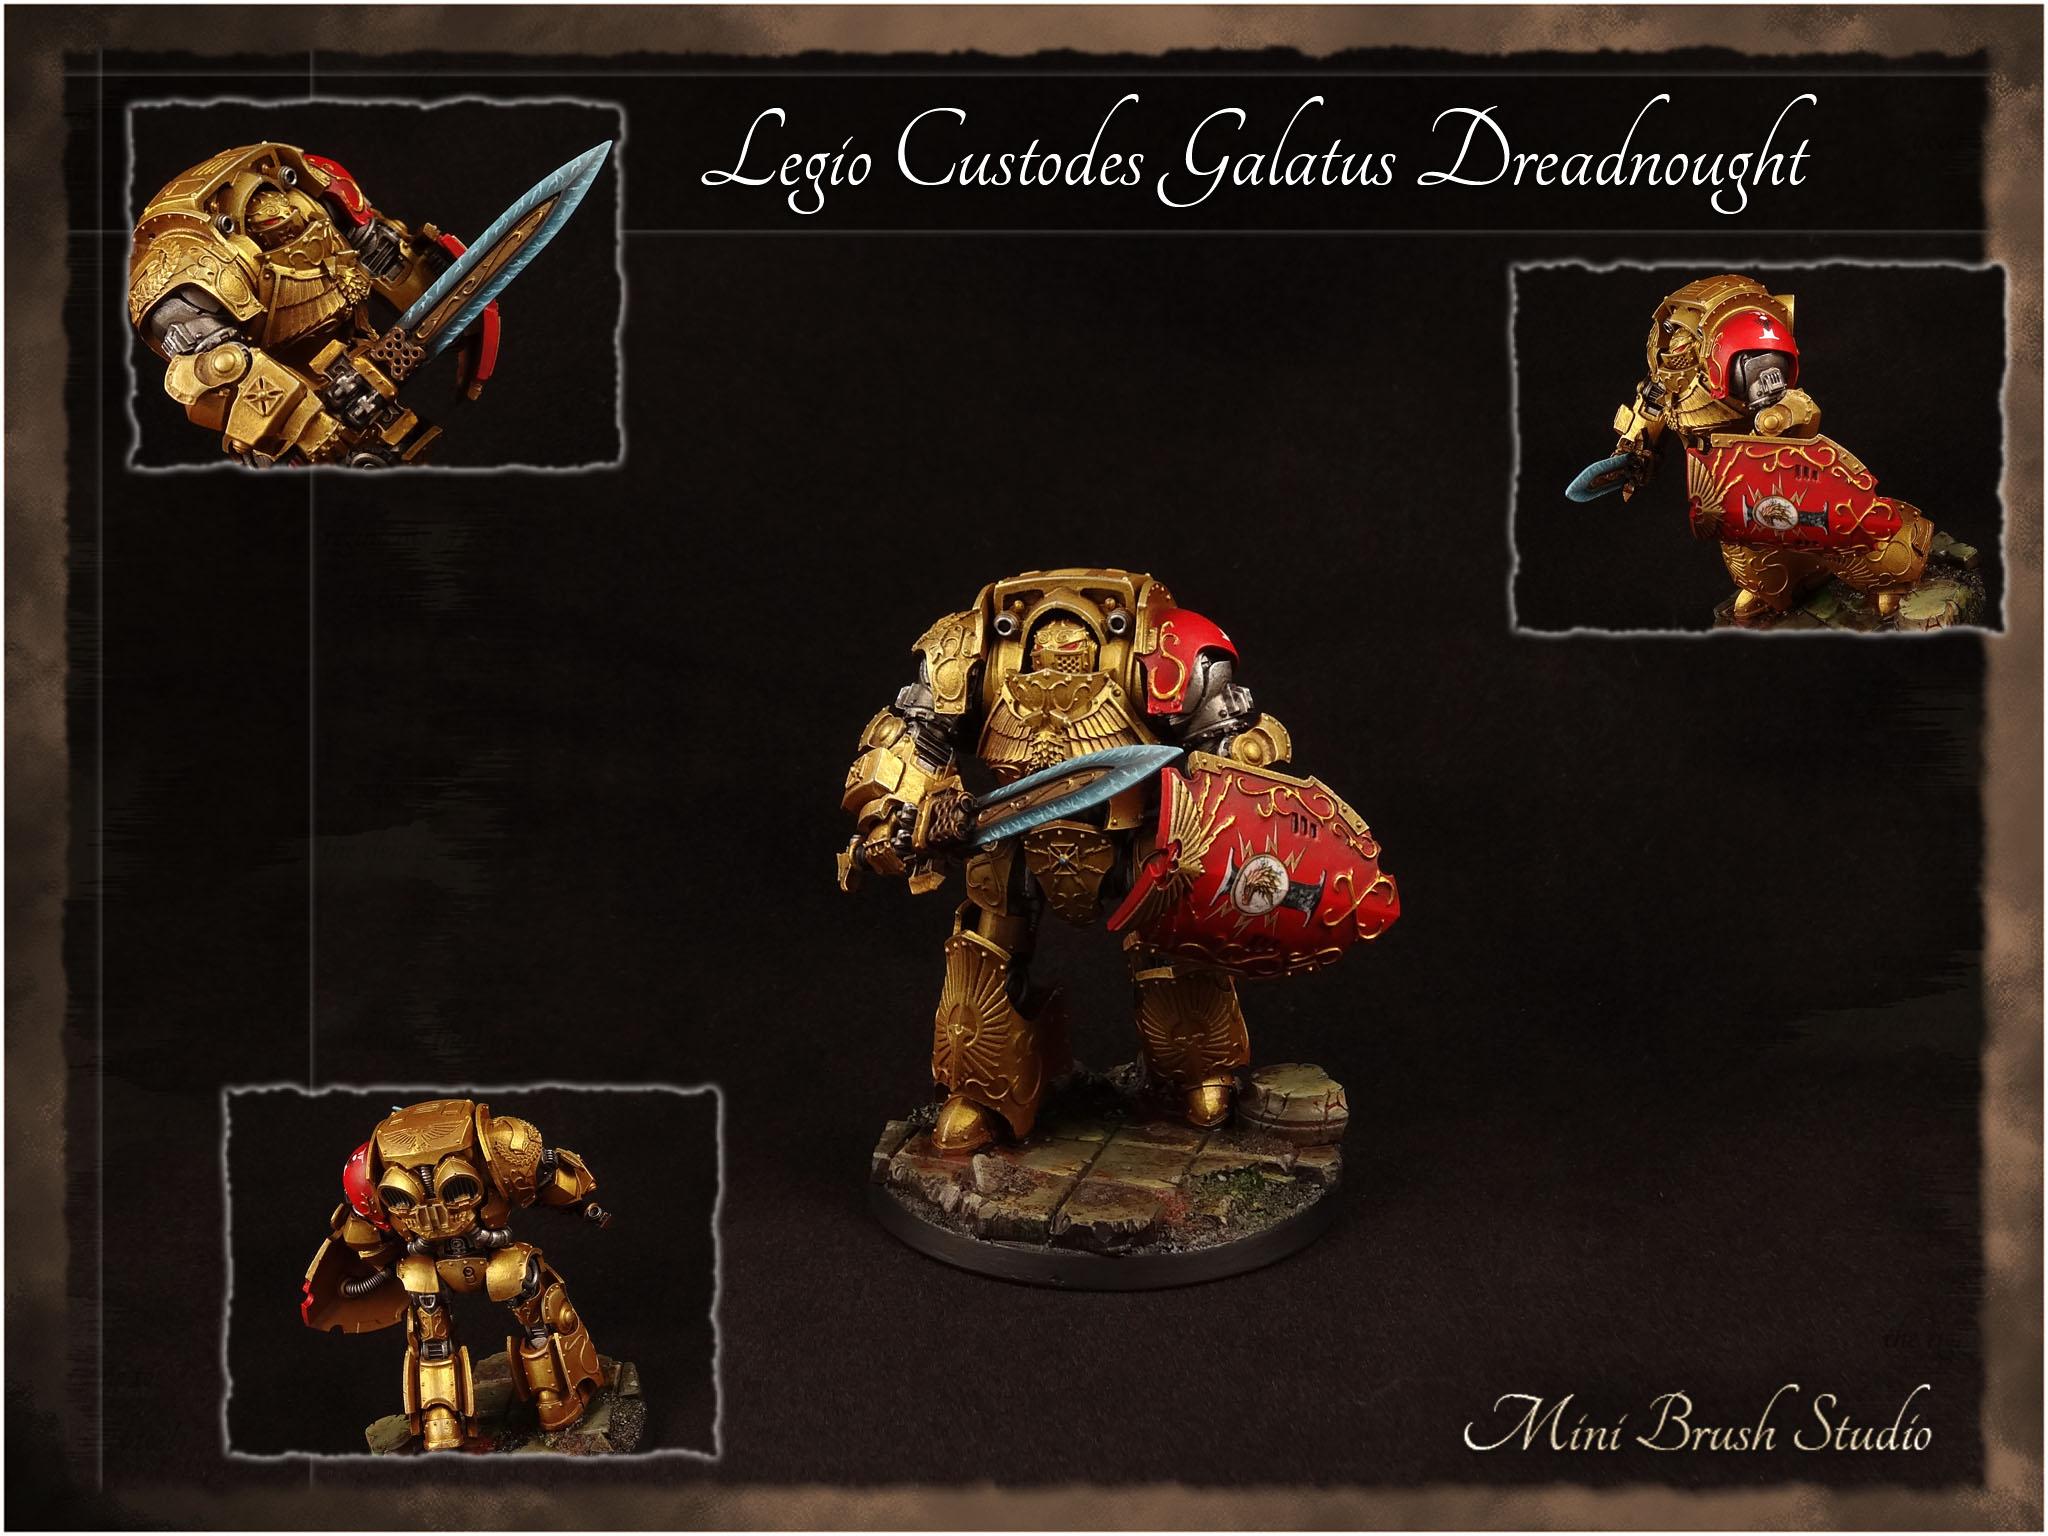 Legio Custodes Contemptor-Galatus Dreadnought 1 v7.00.jpg